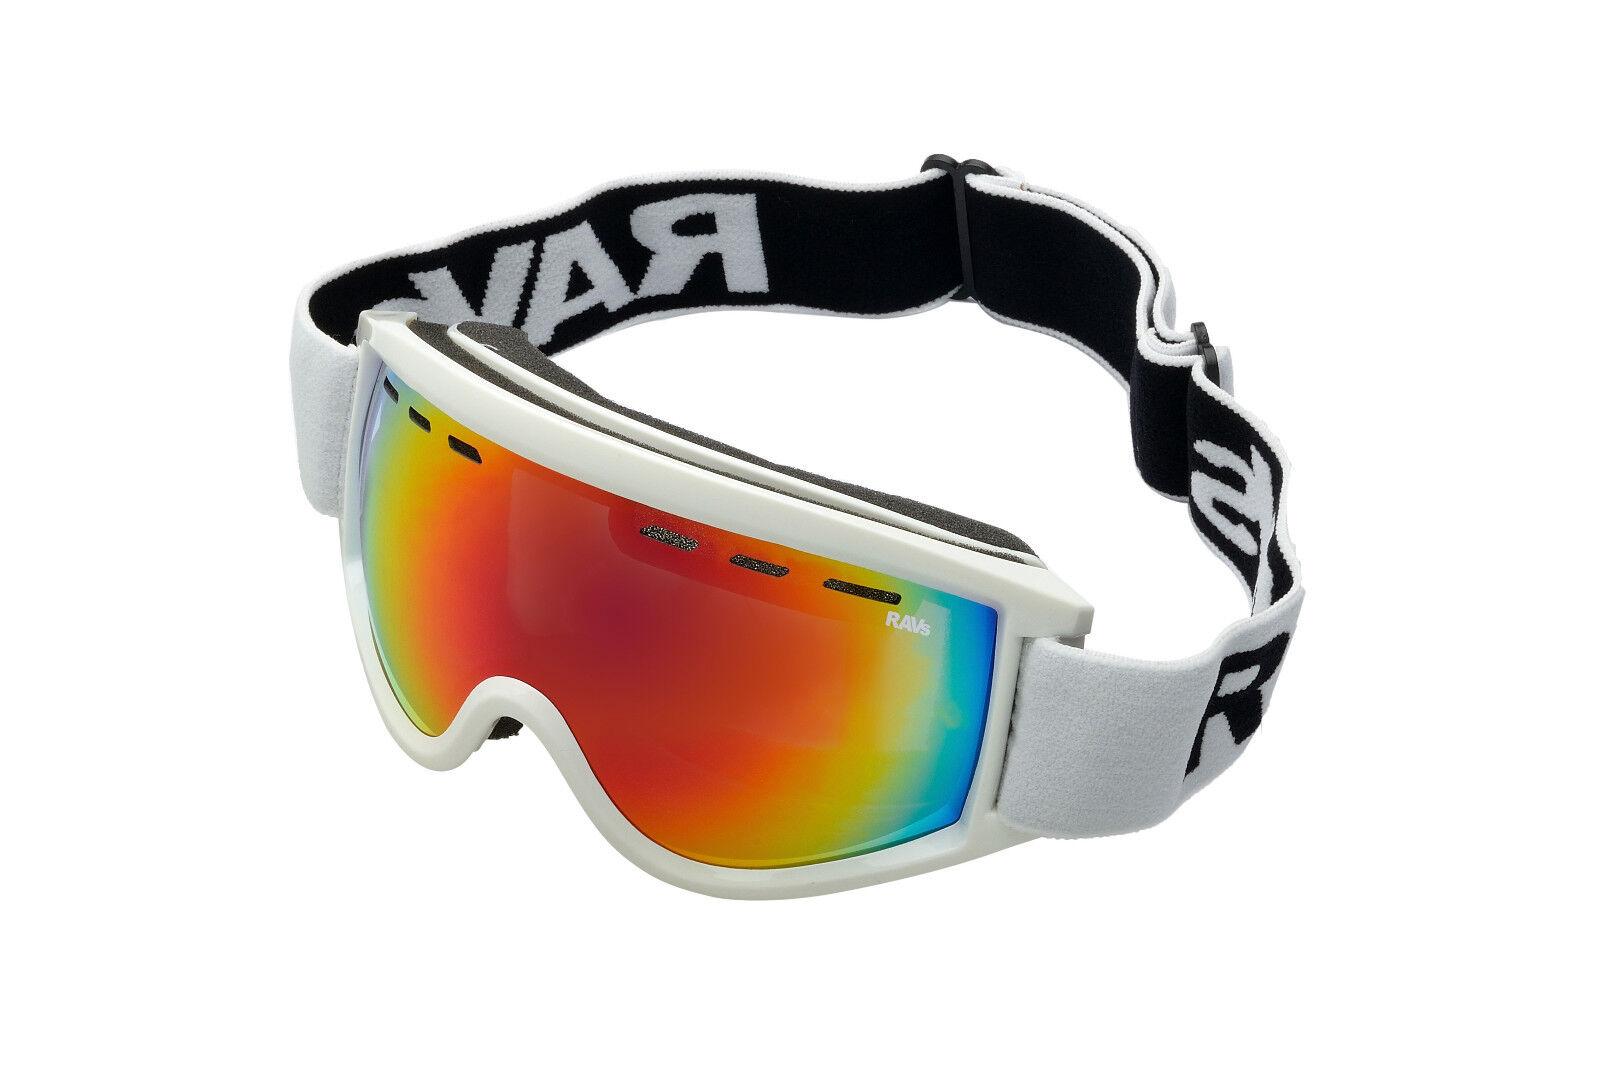 RAVS Snowboarding Goggles- åka skidor-Alpin med Goggles Goggle Snowboard